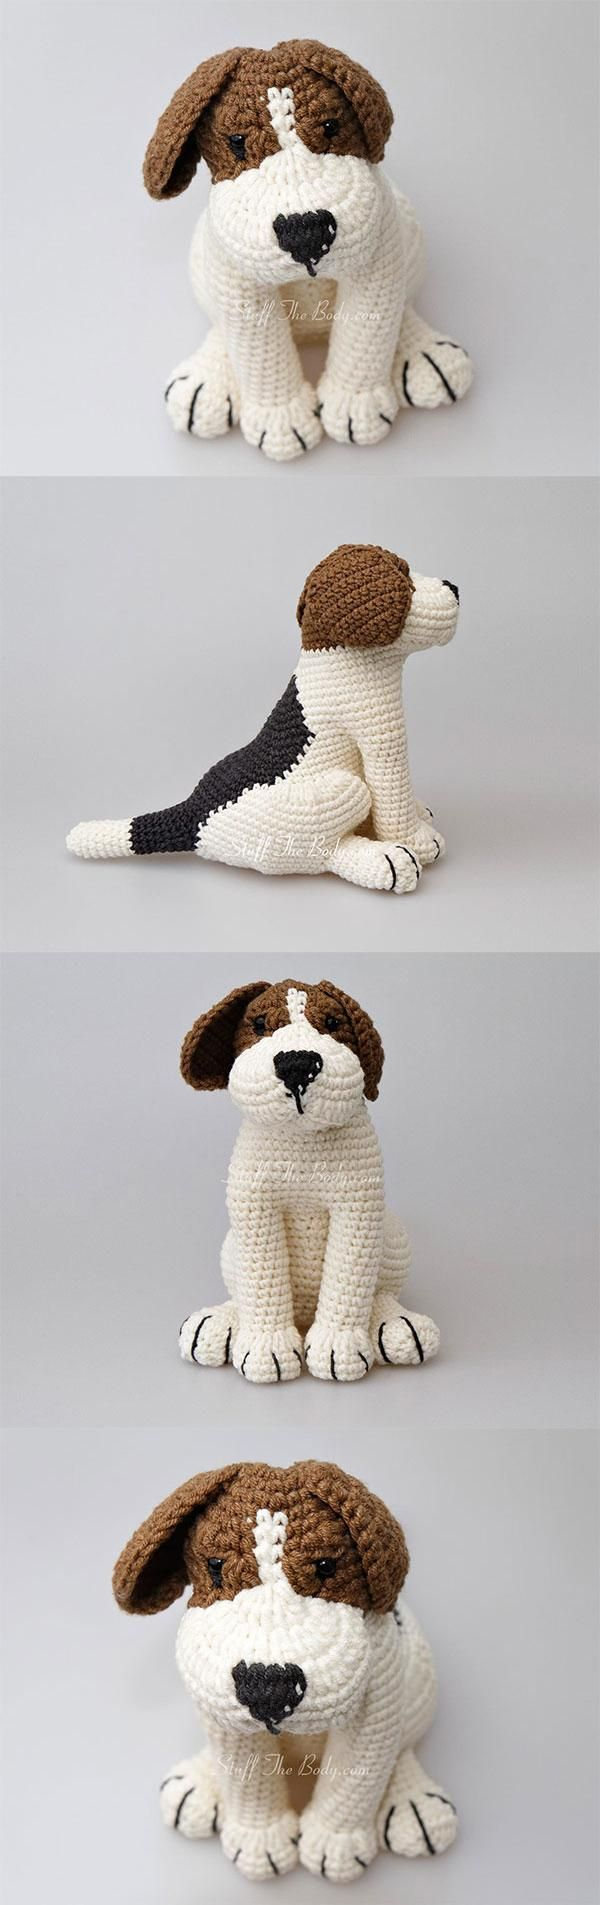 Azor the beagle puppy amigurumi pattern by StuffTheBody   Gehäkelte ...